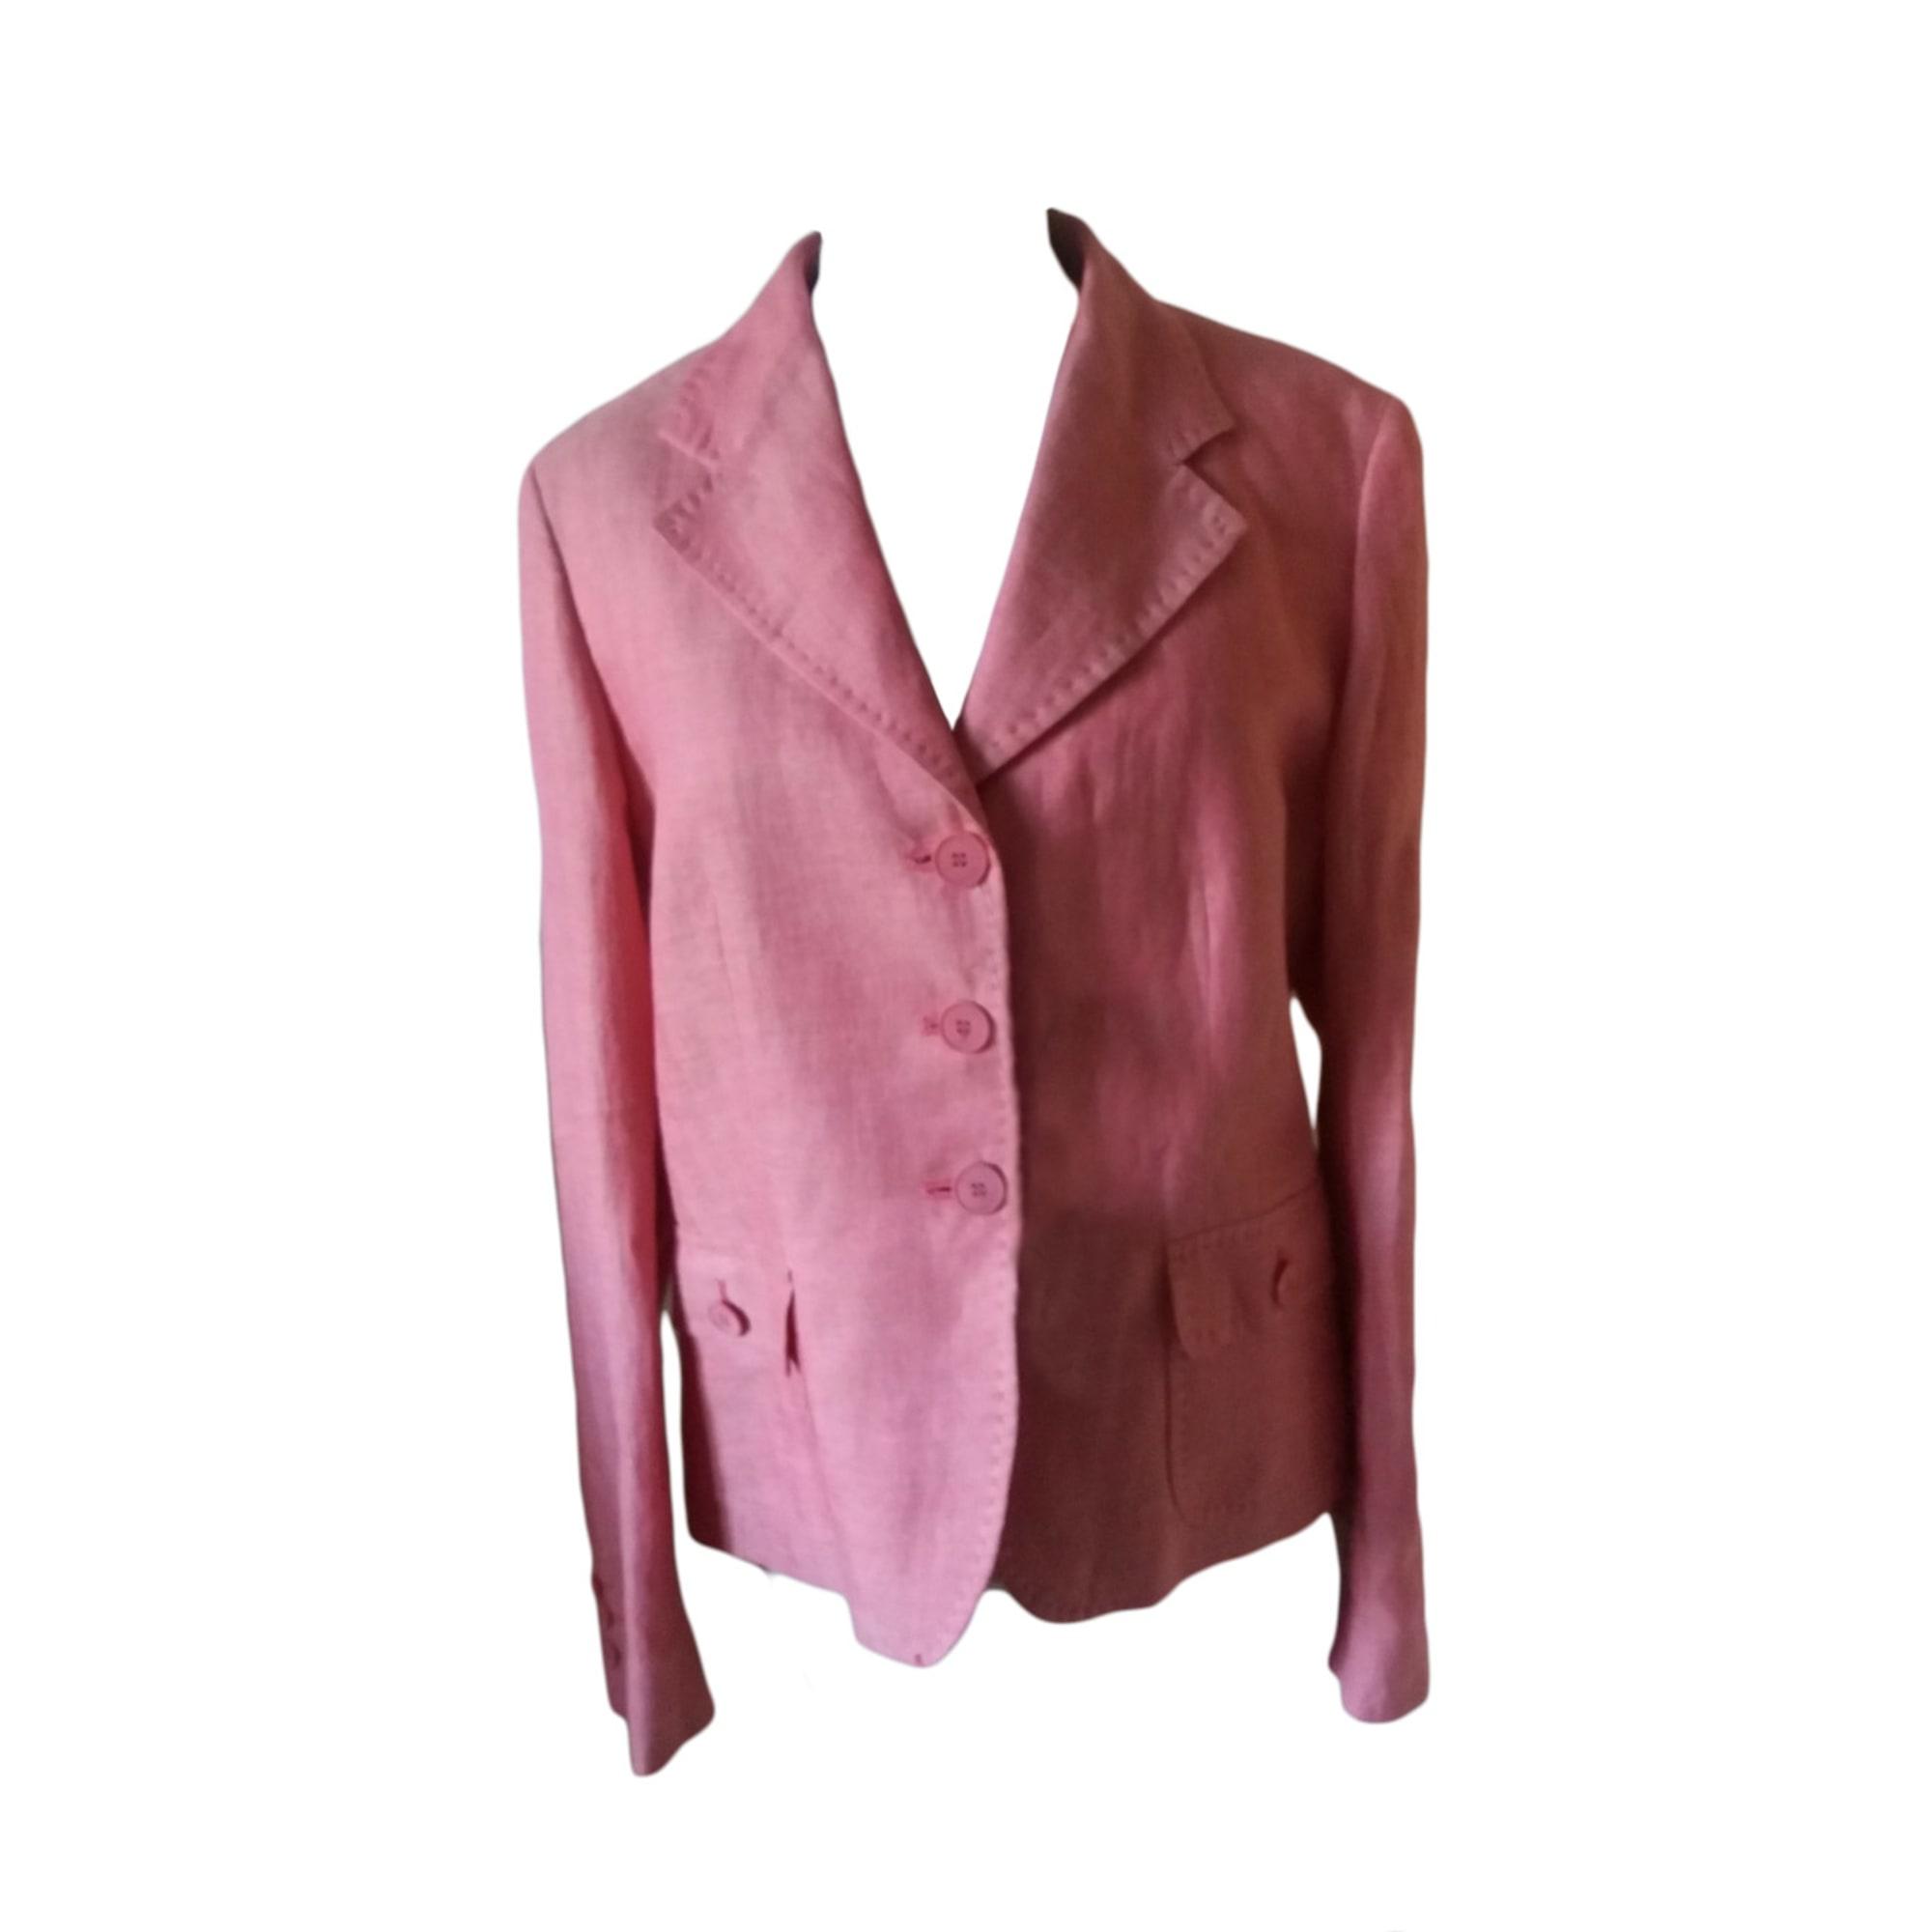 Blazer, veste tailleur MAX MARA Rose, fuschia, vieux rose